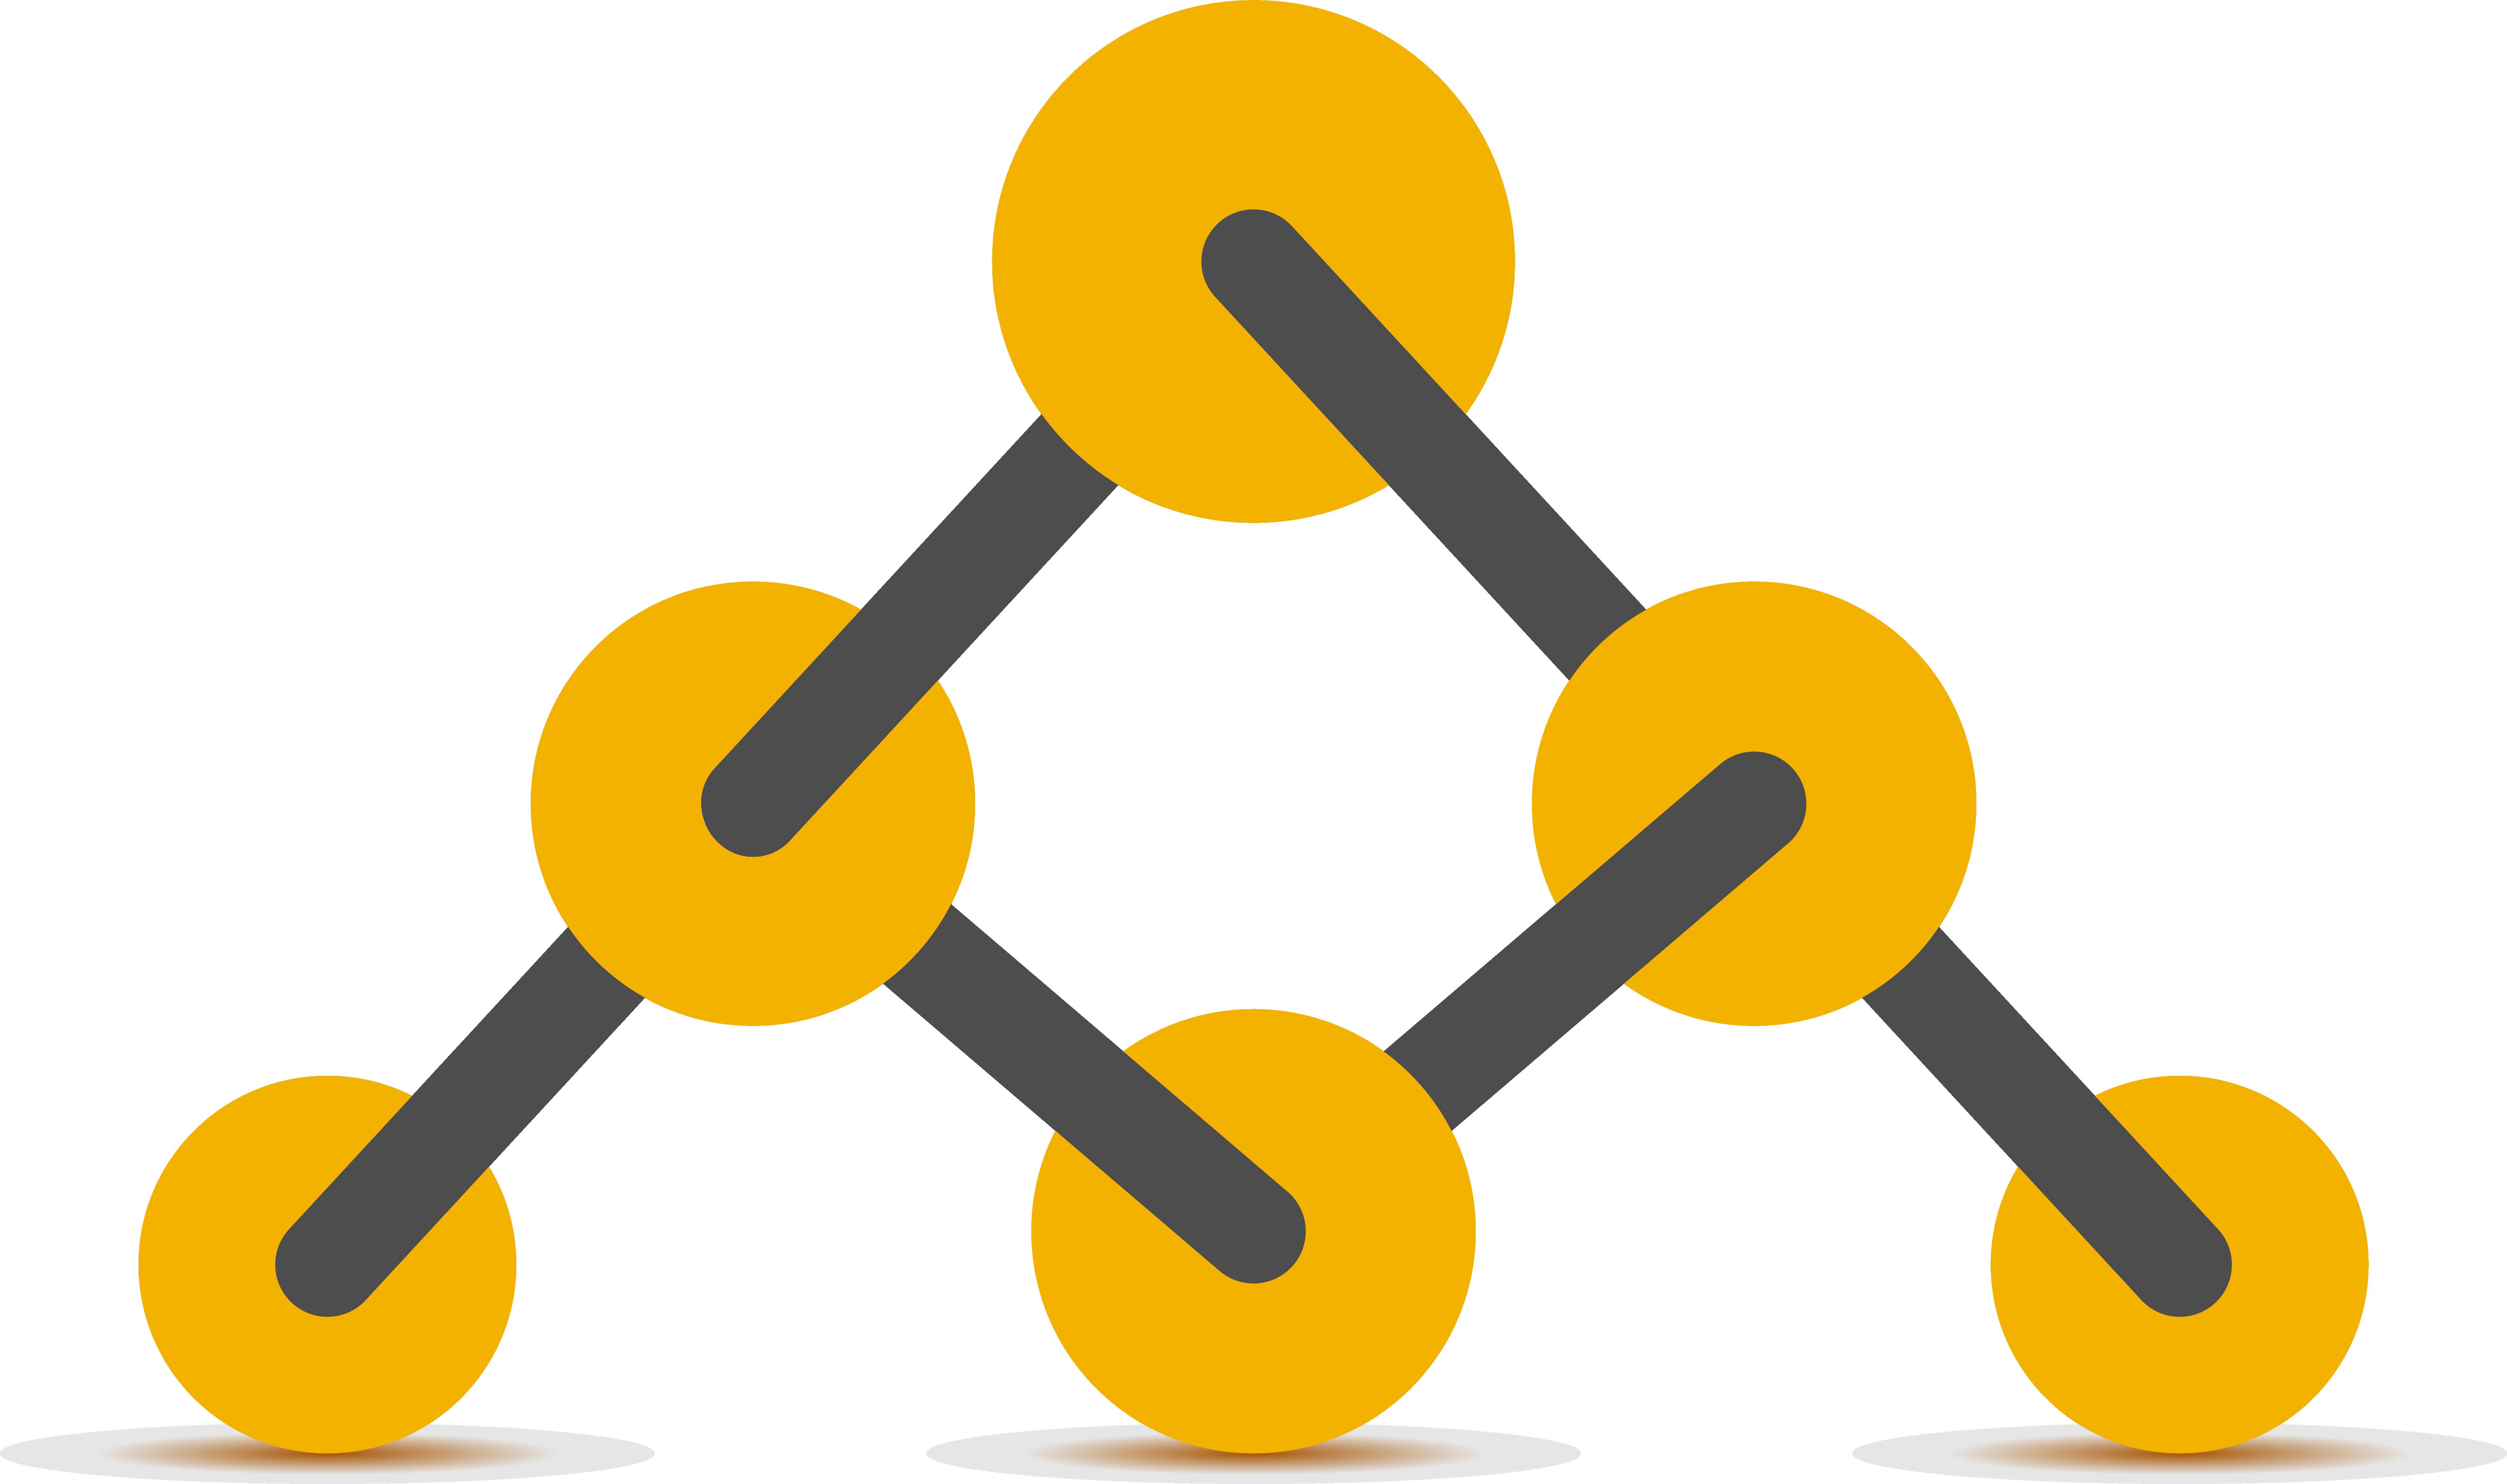 Design a logo for a construction company